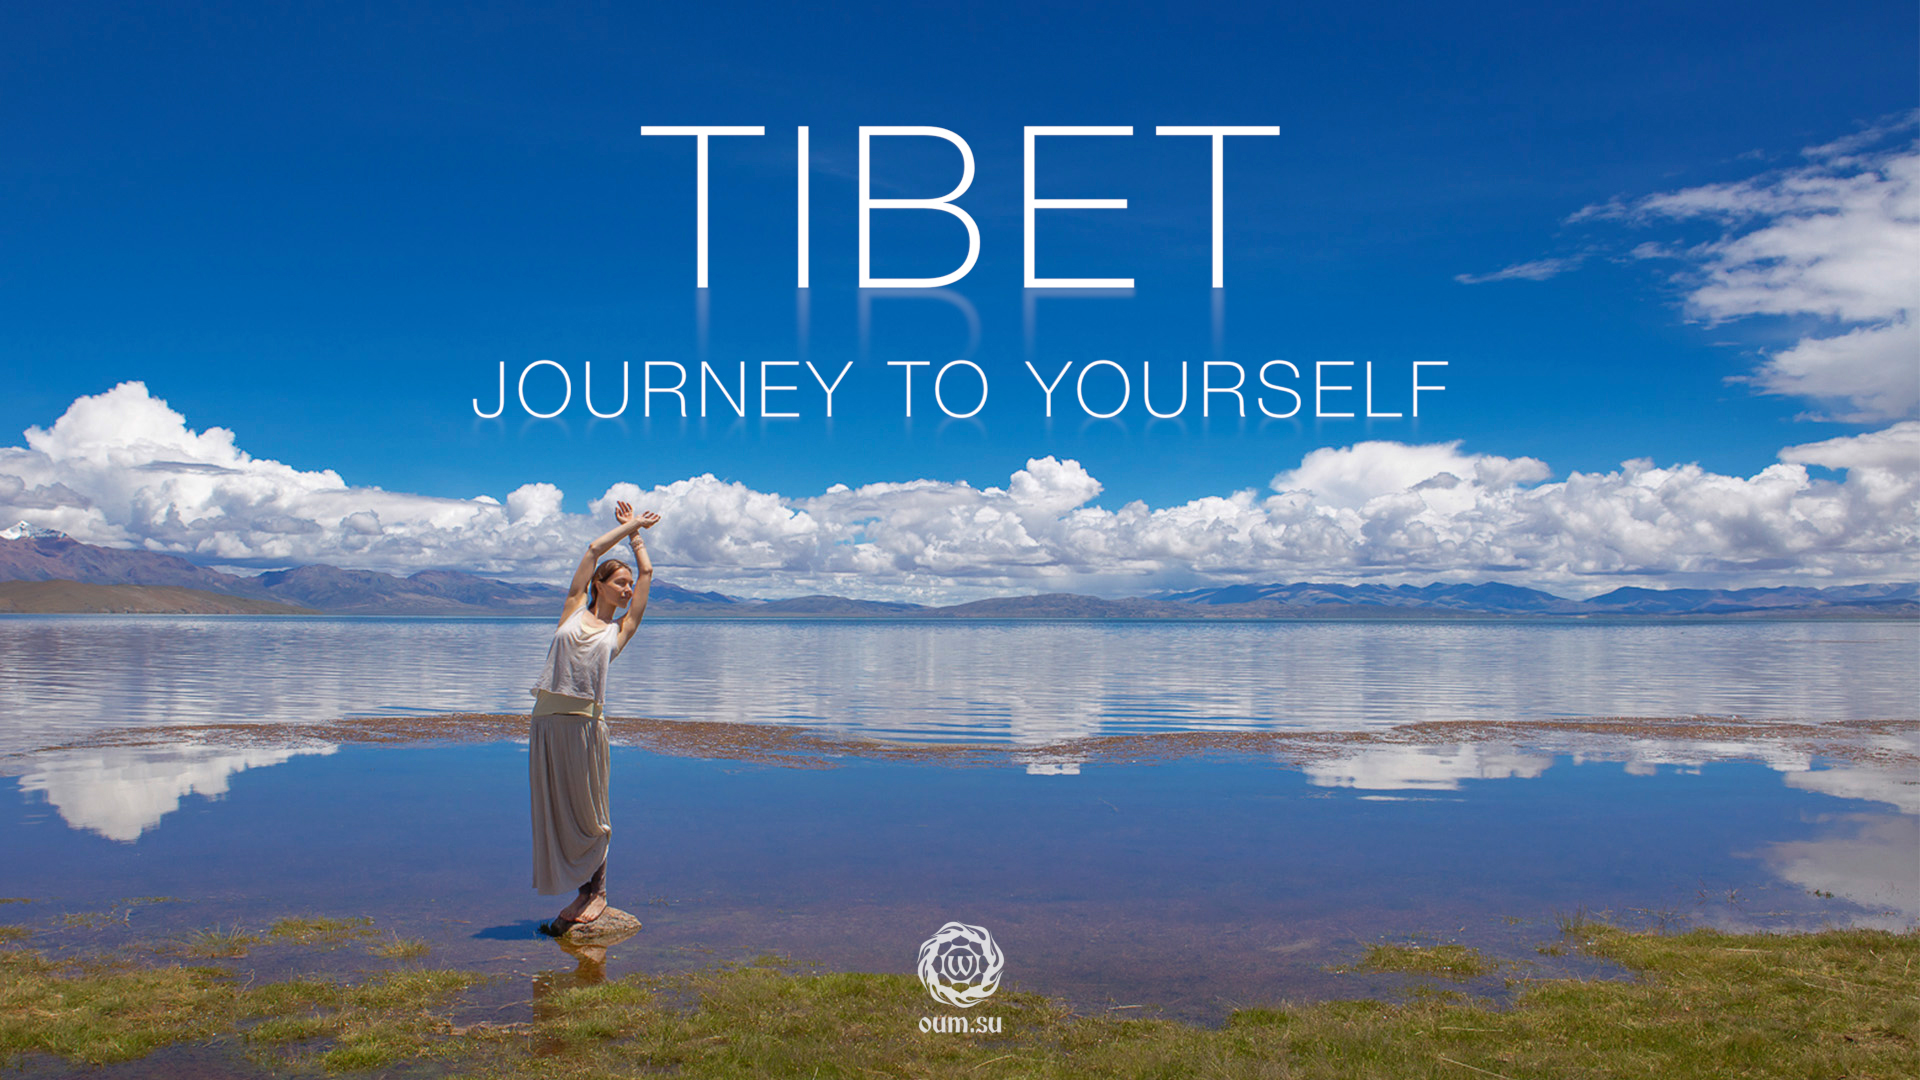 Tibet. Journey To Yourself